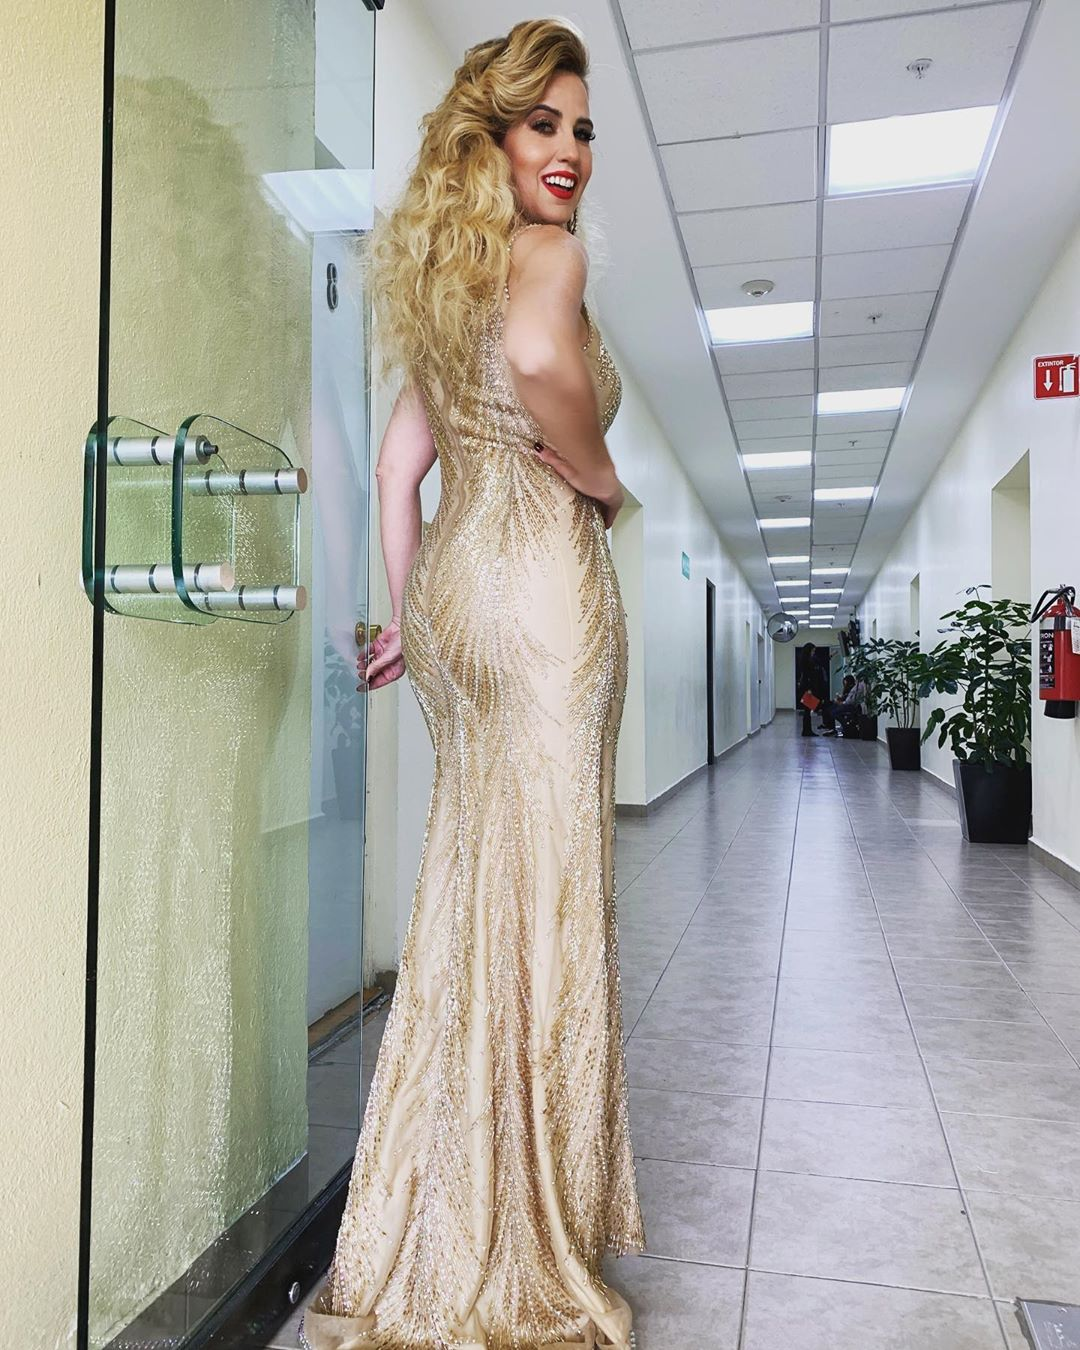 Raquel Bigorra 1